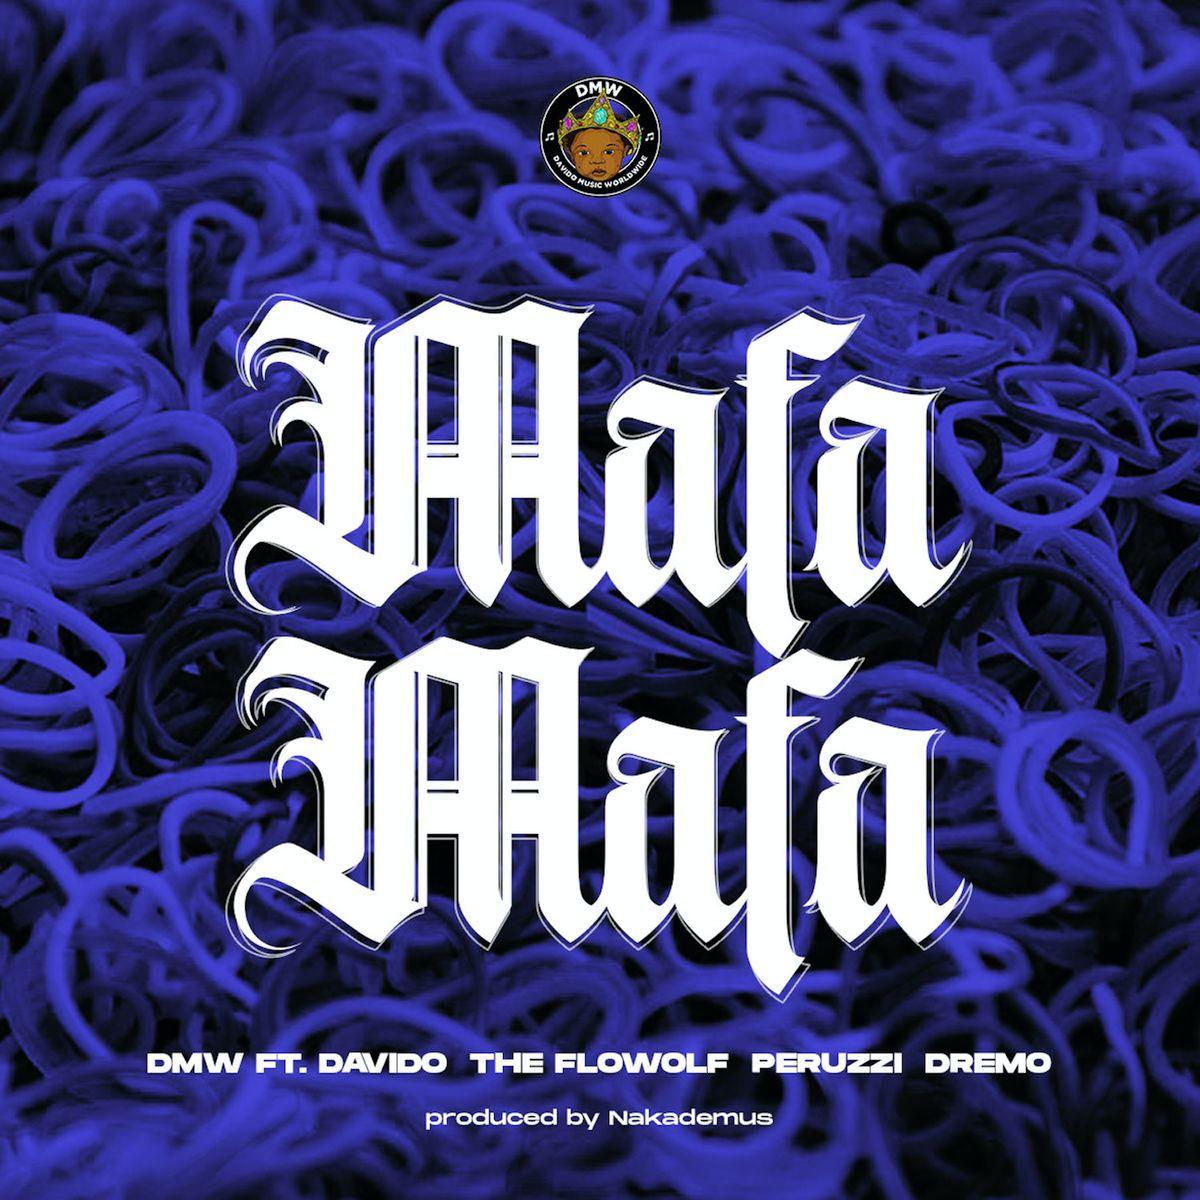 DMW ft. Davido, The Flowolf, Peruzzi & Dremo - Mafa Mafa